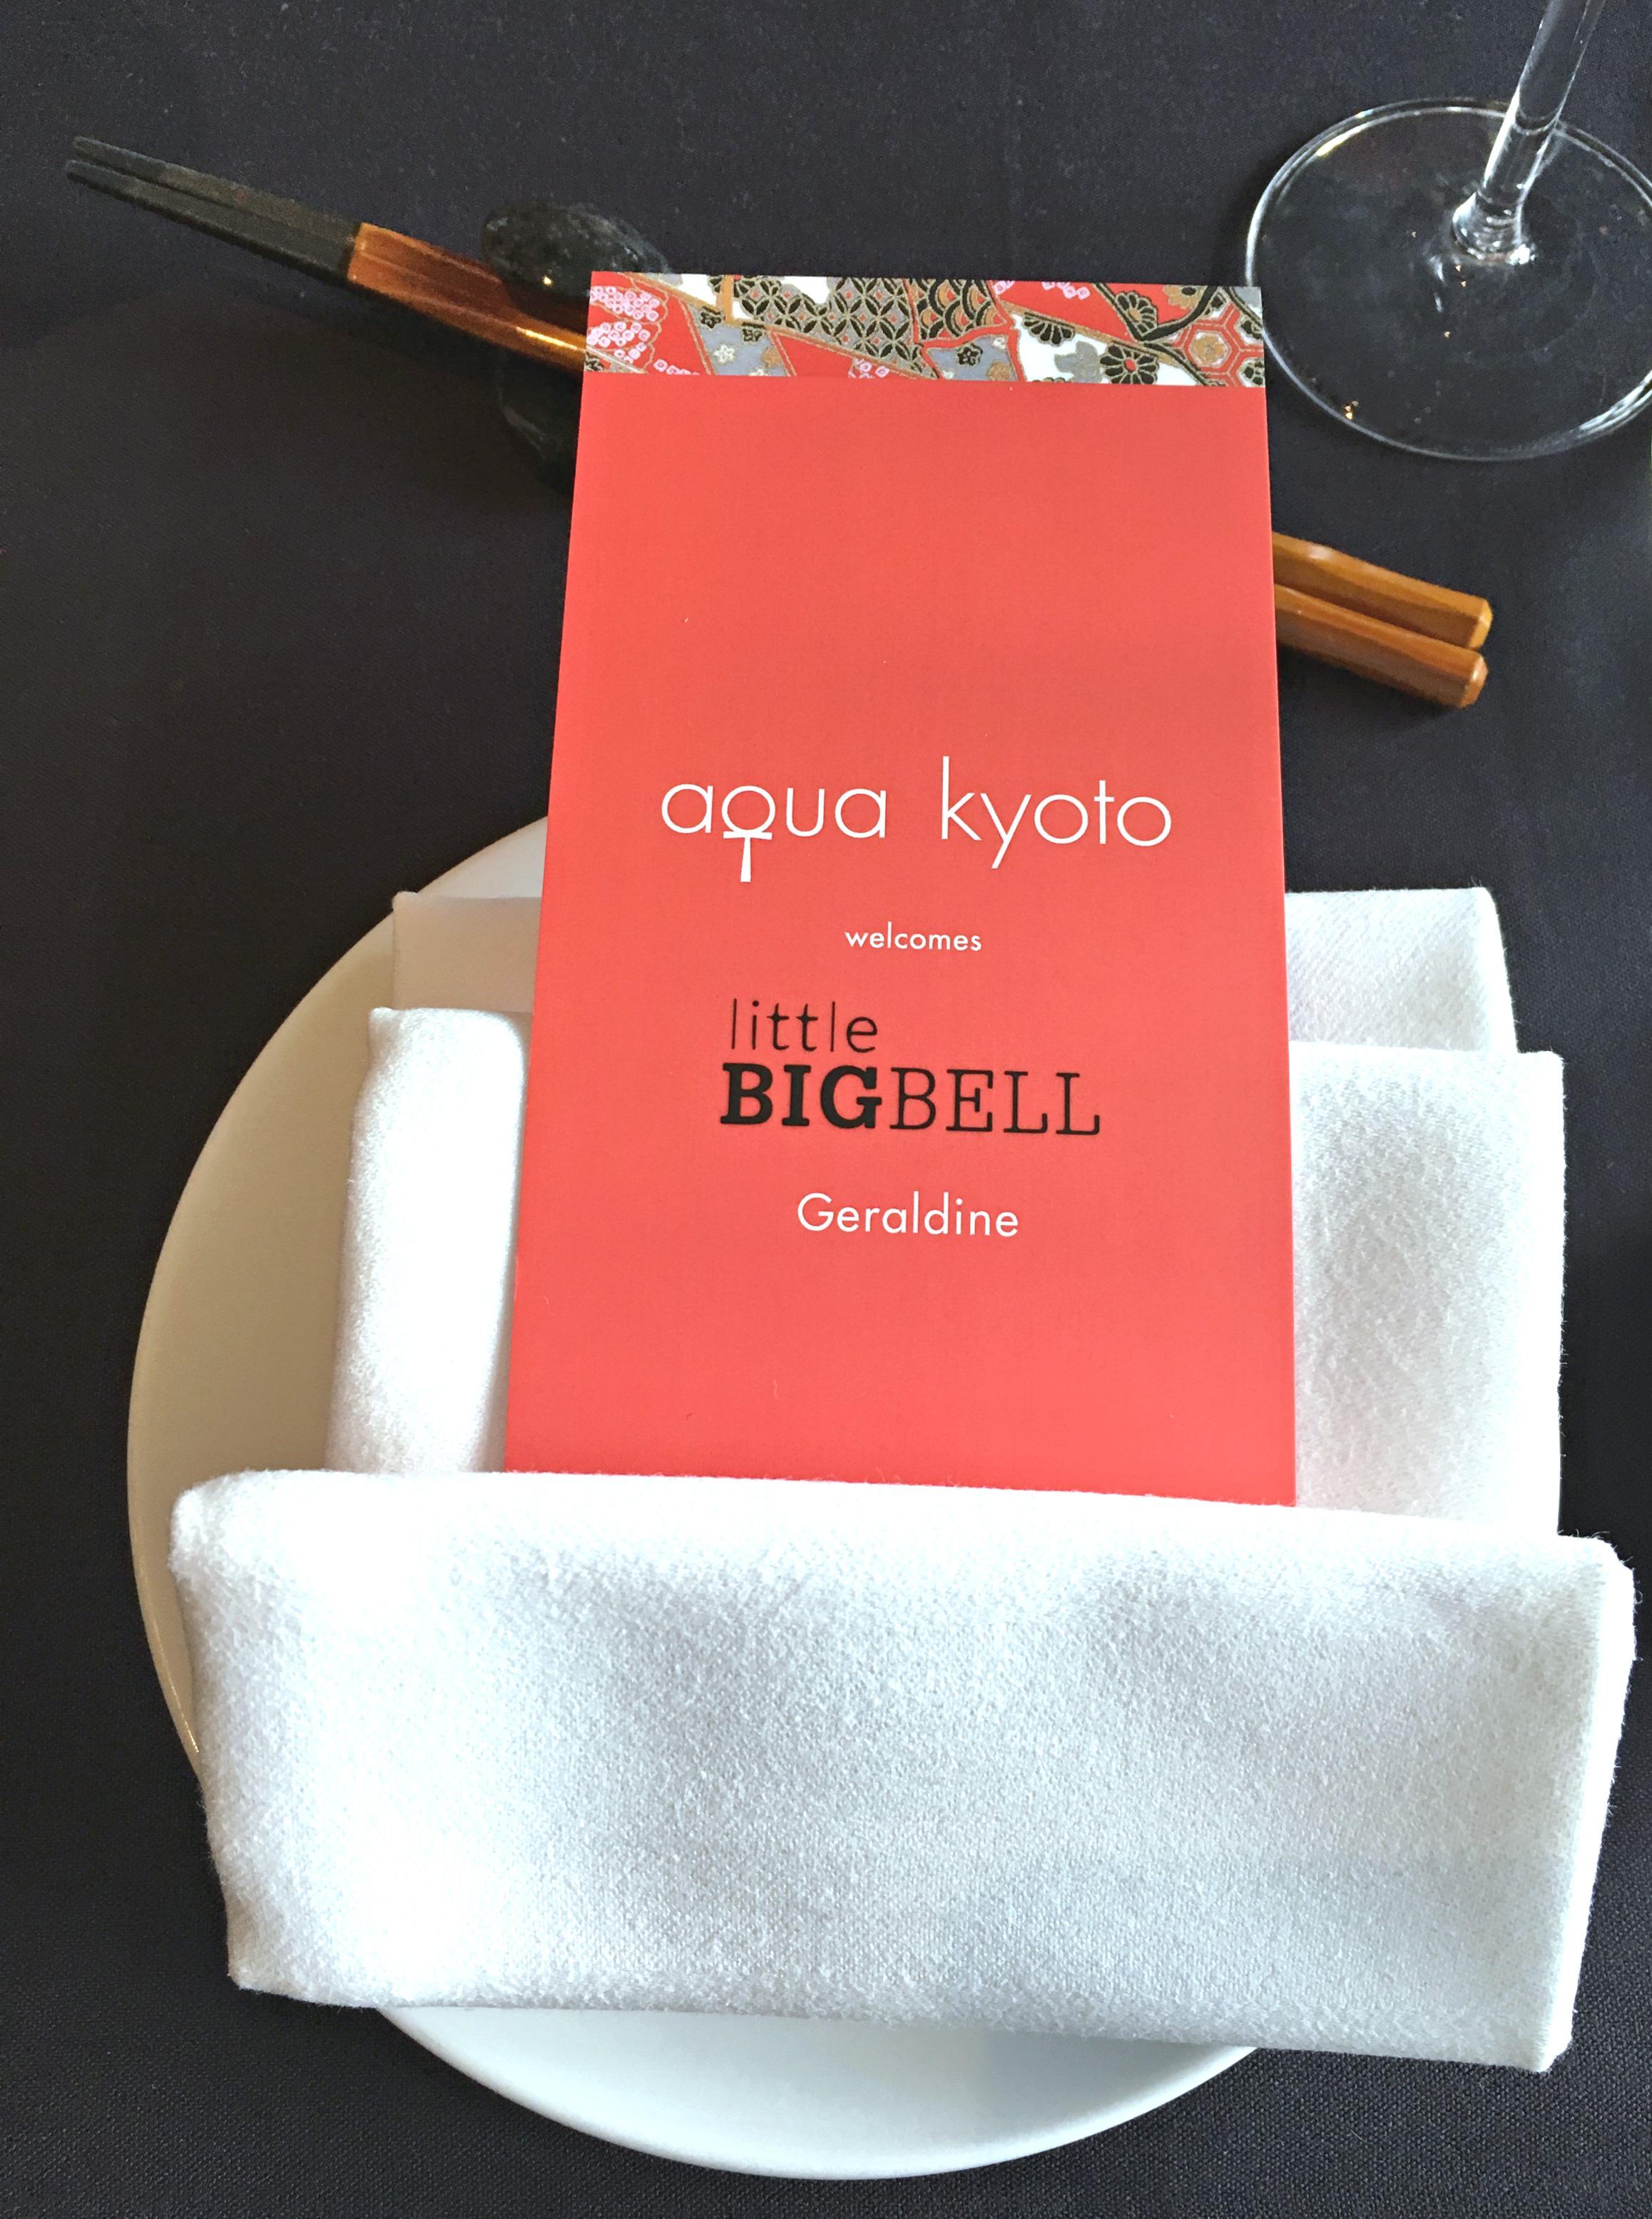 Weekend brunch at Aqua Kyoto restaurant in London